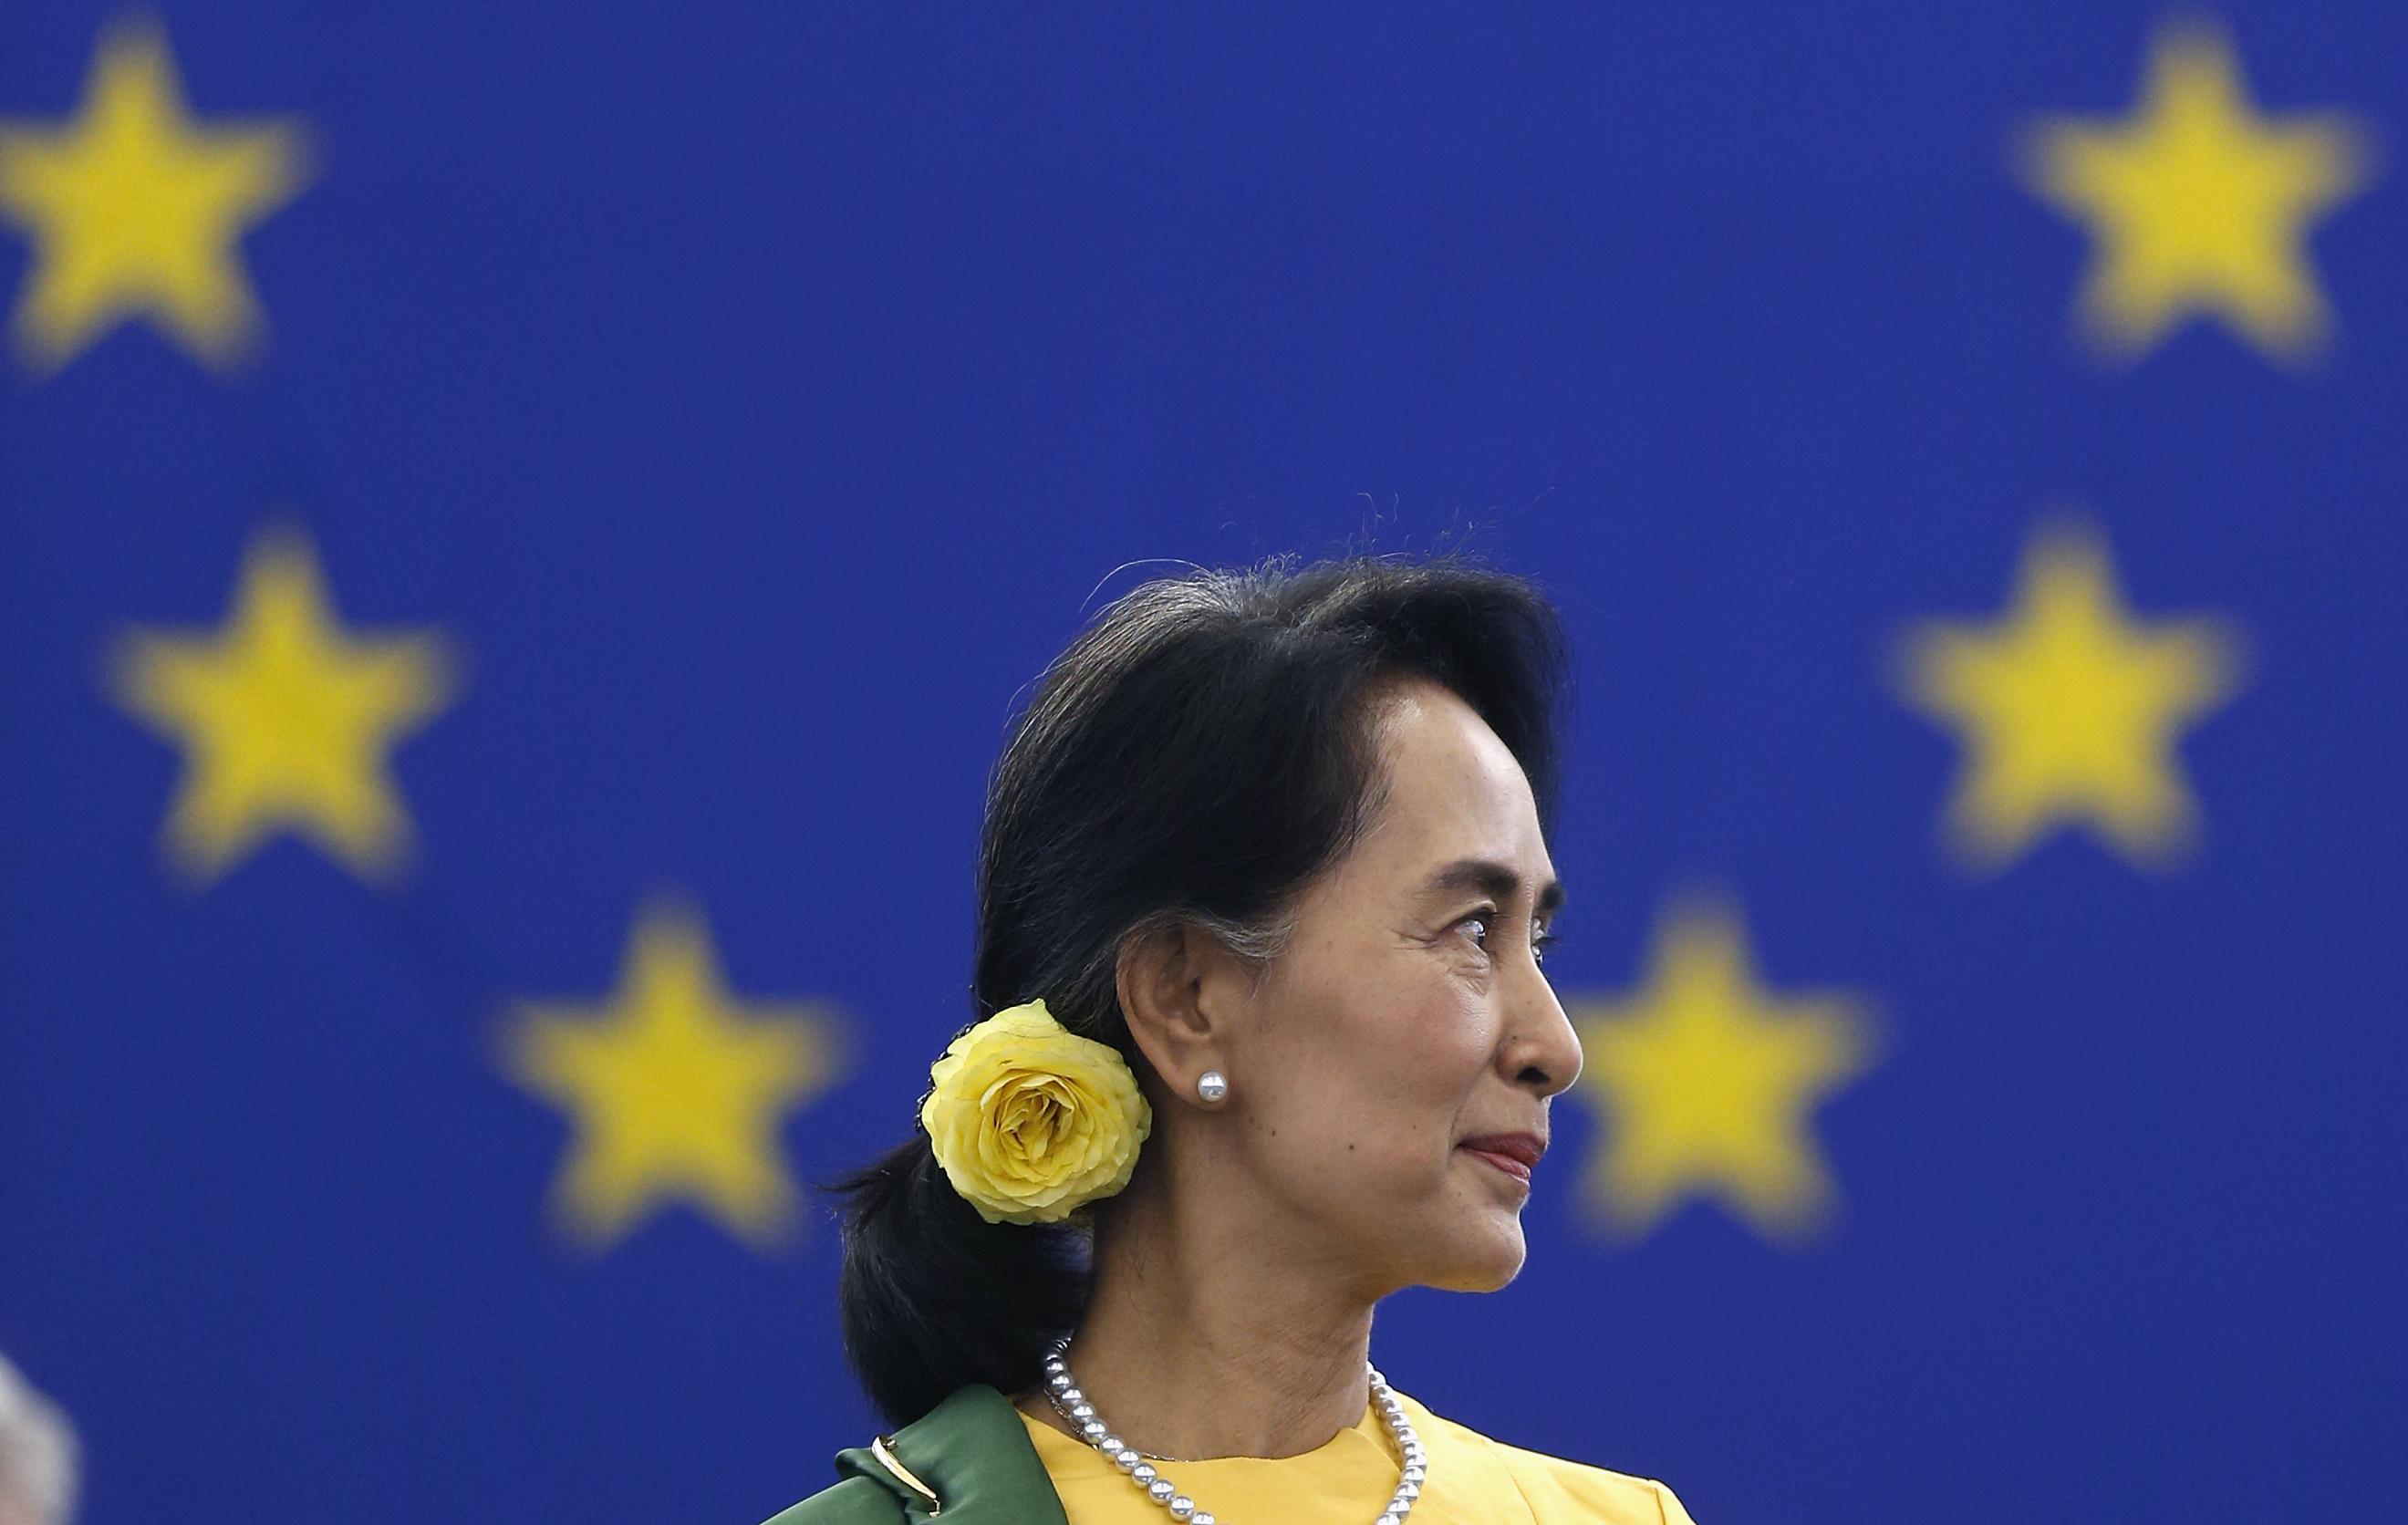 aung san suu kyi nobel laureate and burmese opposition leader aung san suu kyi pictures. Black Bedroom Furniture Sets. Home Design Ideas